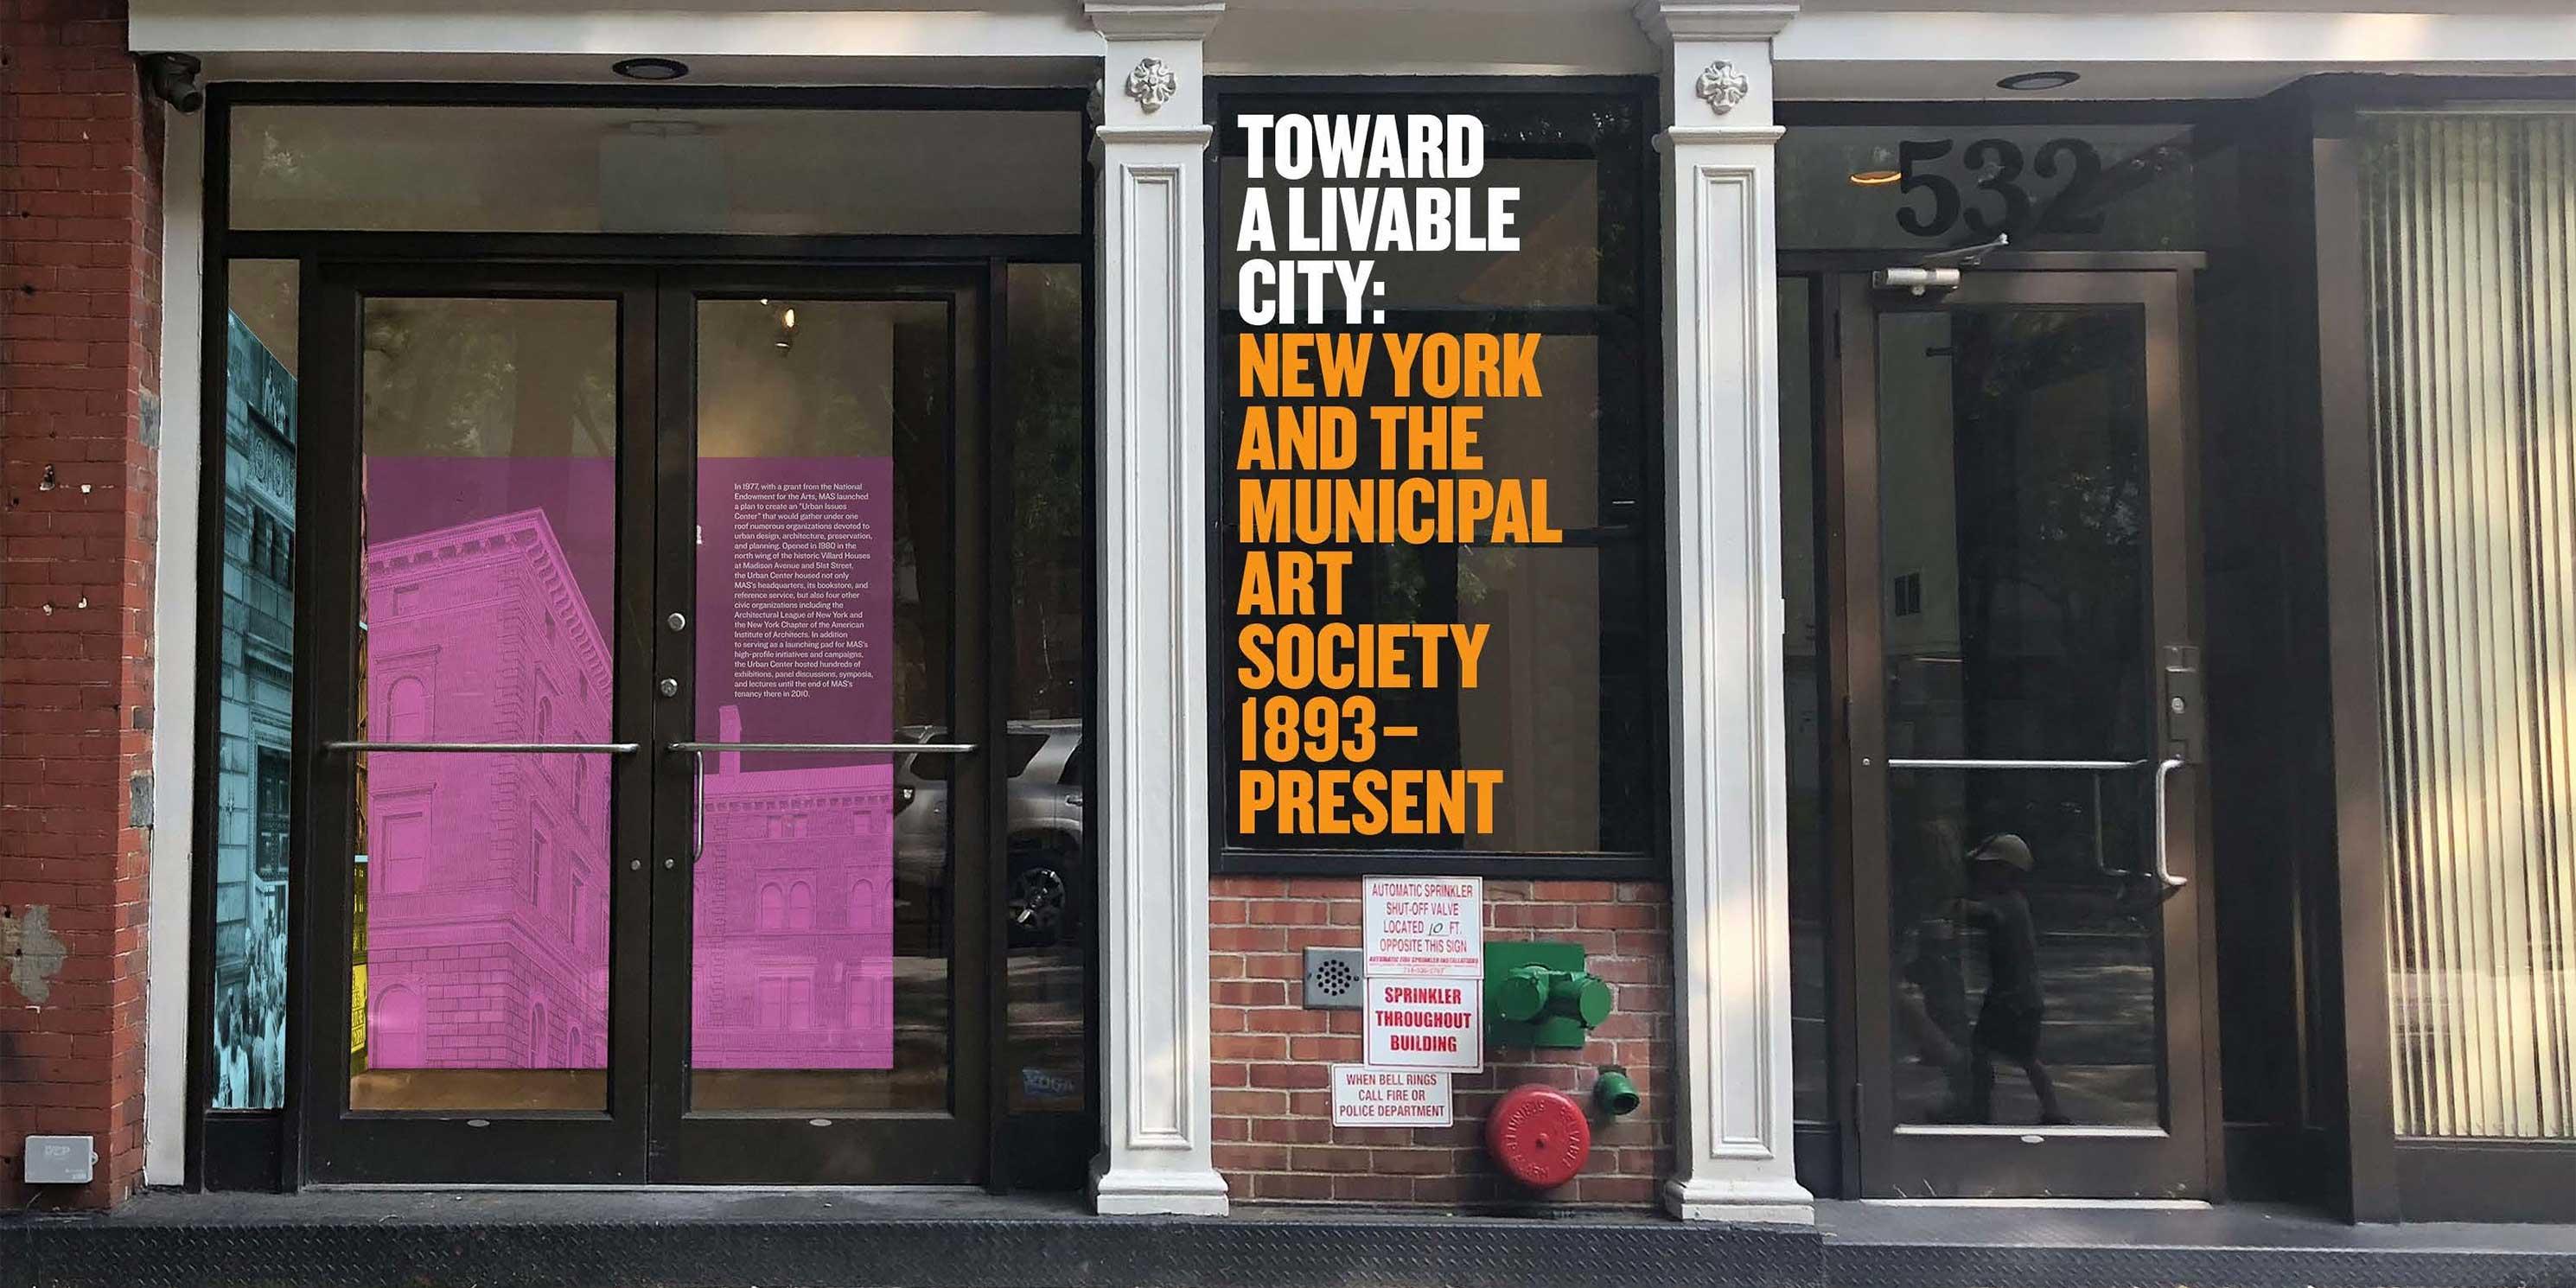 entrance to the exhibit, Toward a Livable City